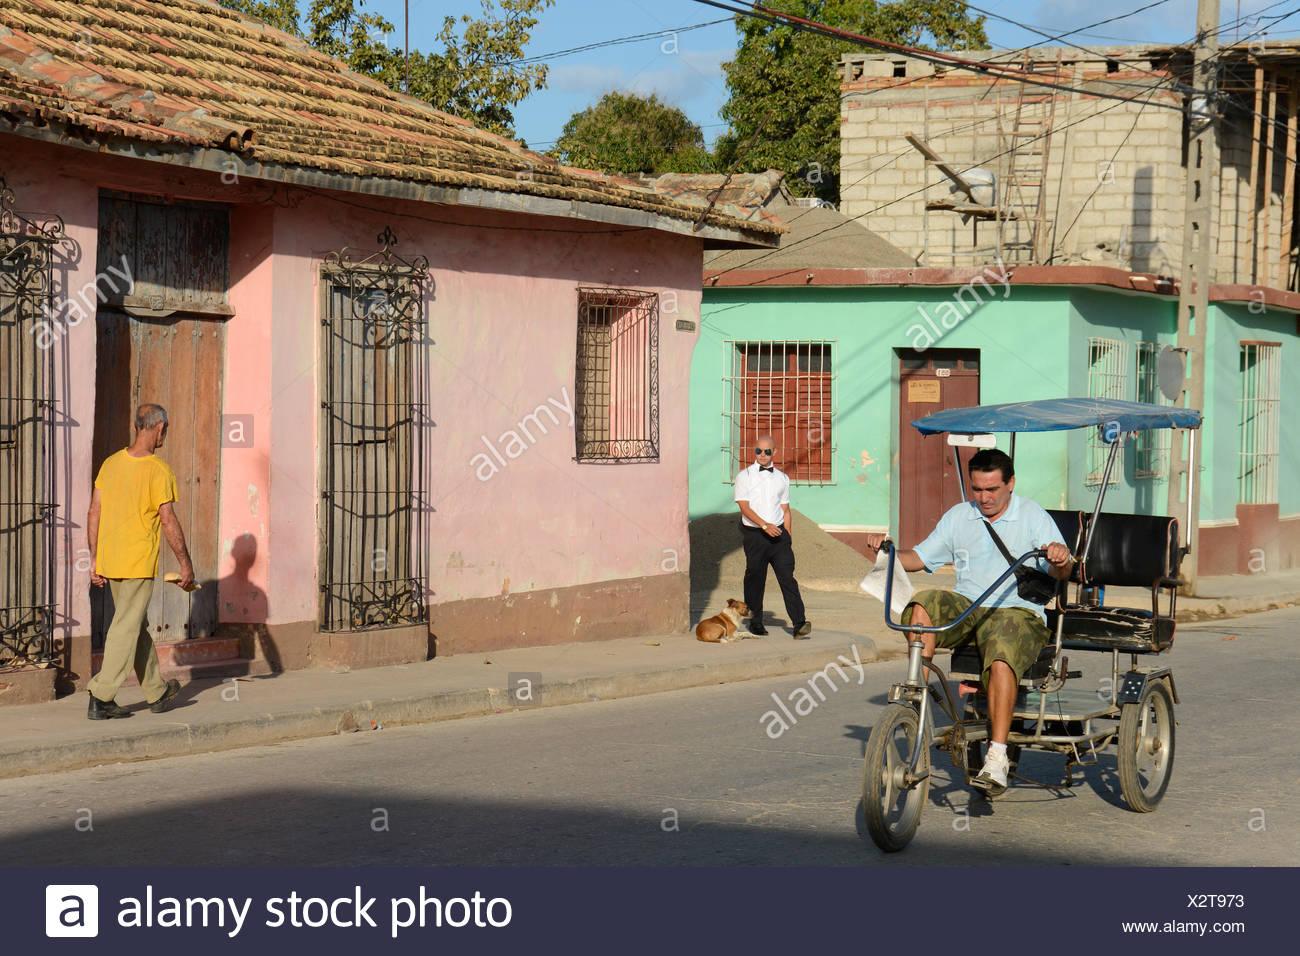 Sreet scene with pedicab, Trinidad,  Cuba - Stock Image